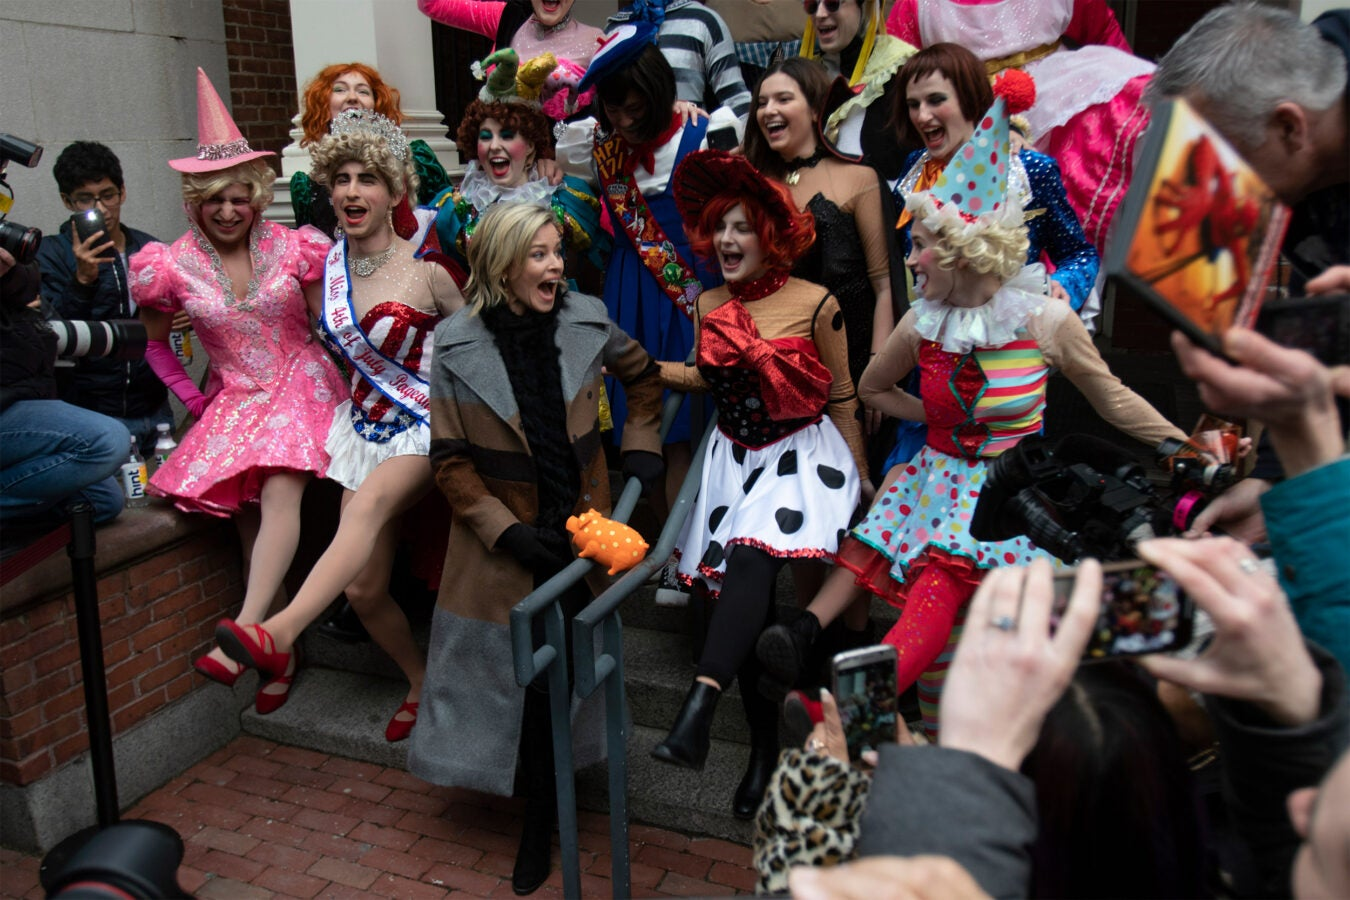 Hasty Pudding Woman of the Year Elizabeth Banks dancing on sidewalk.